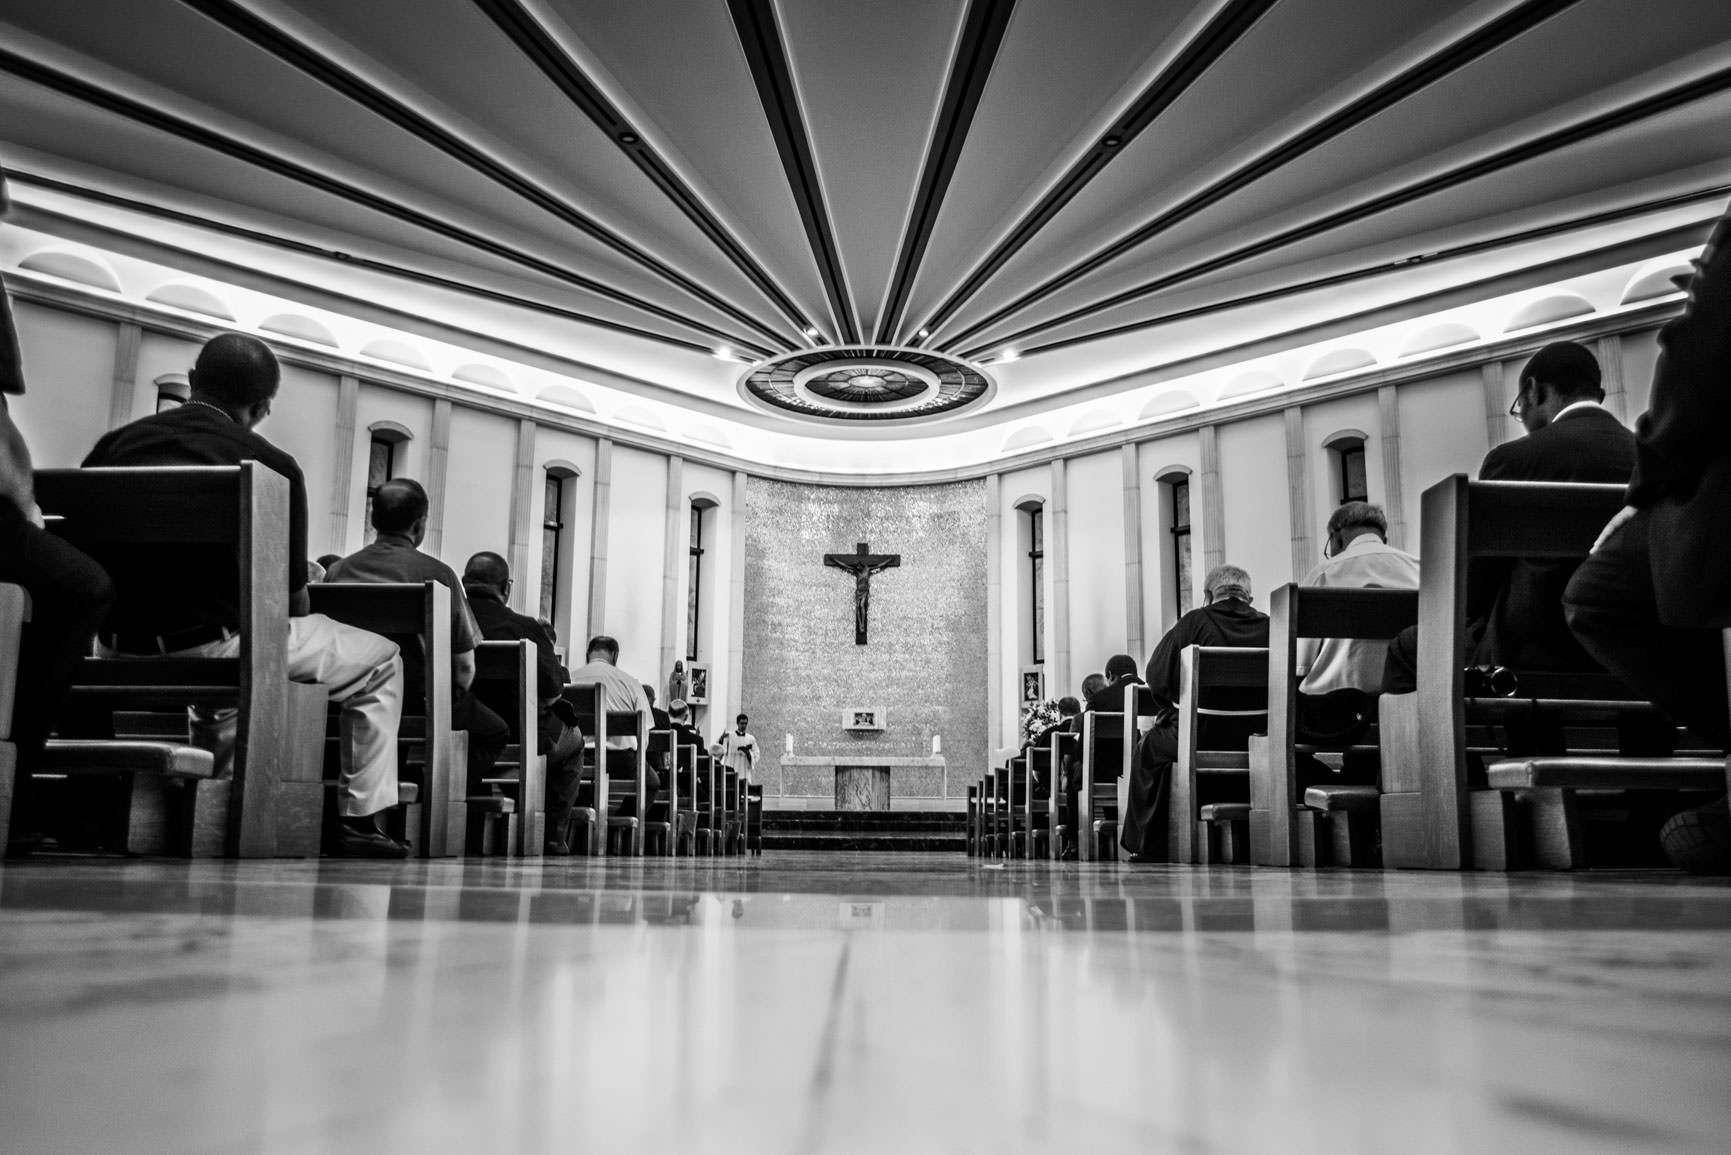 Why do Catholics call it the Mass?